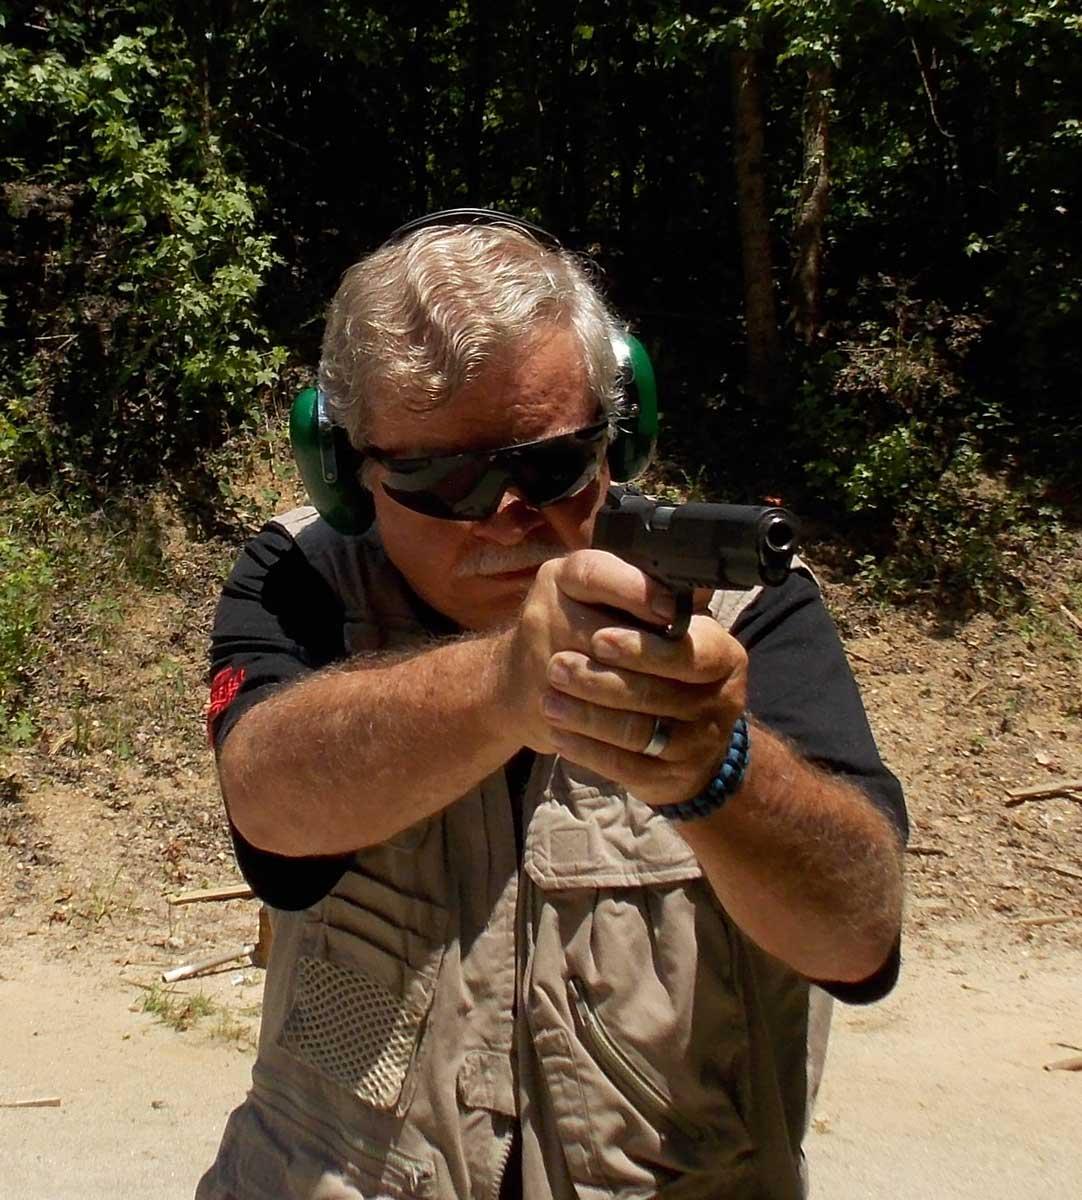 Posed to shoot Springfield's Range Officer 1911 pistol